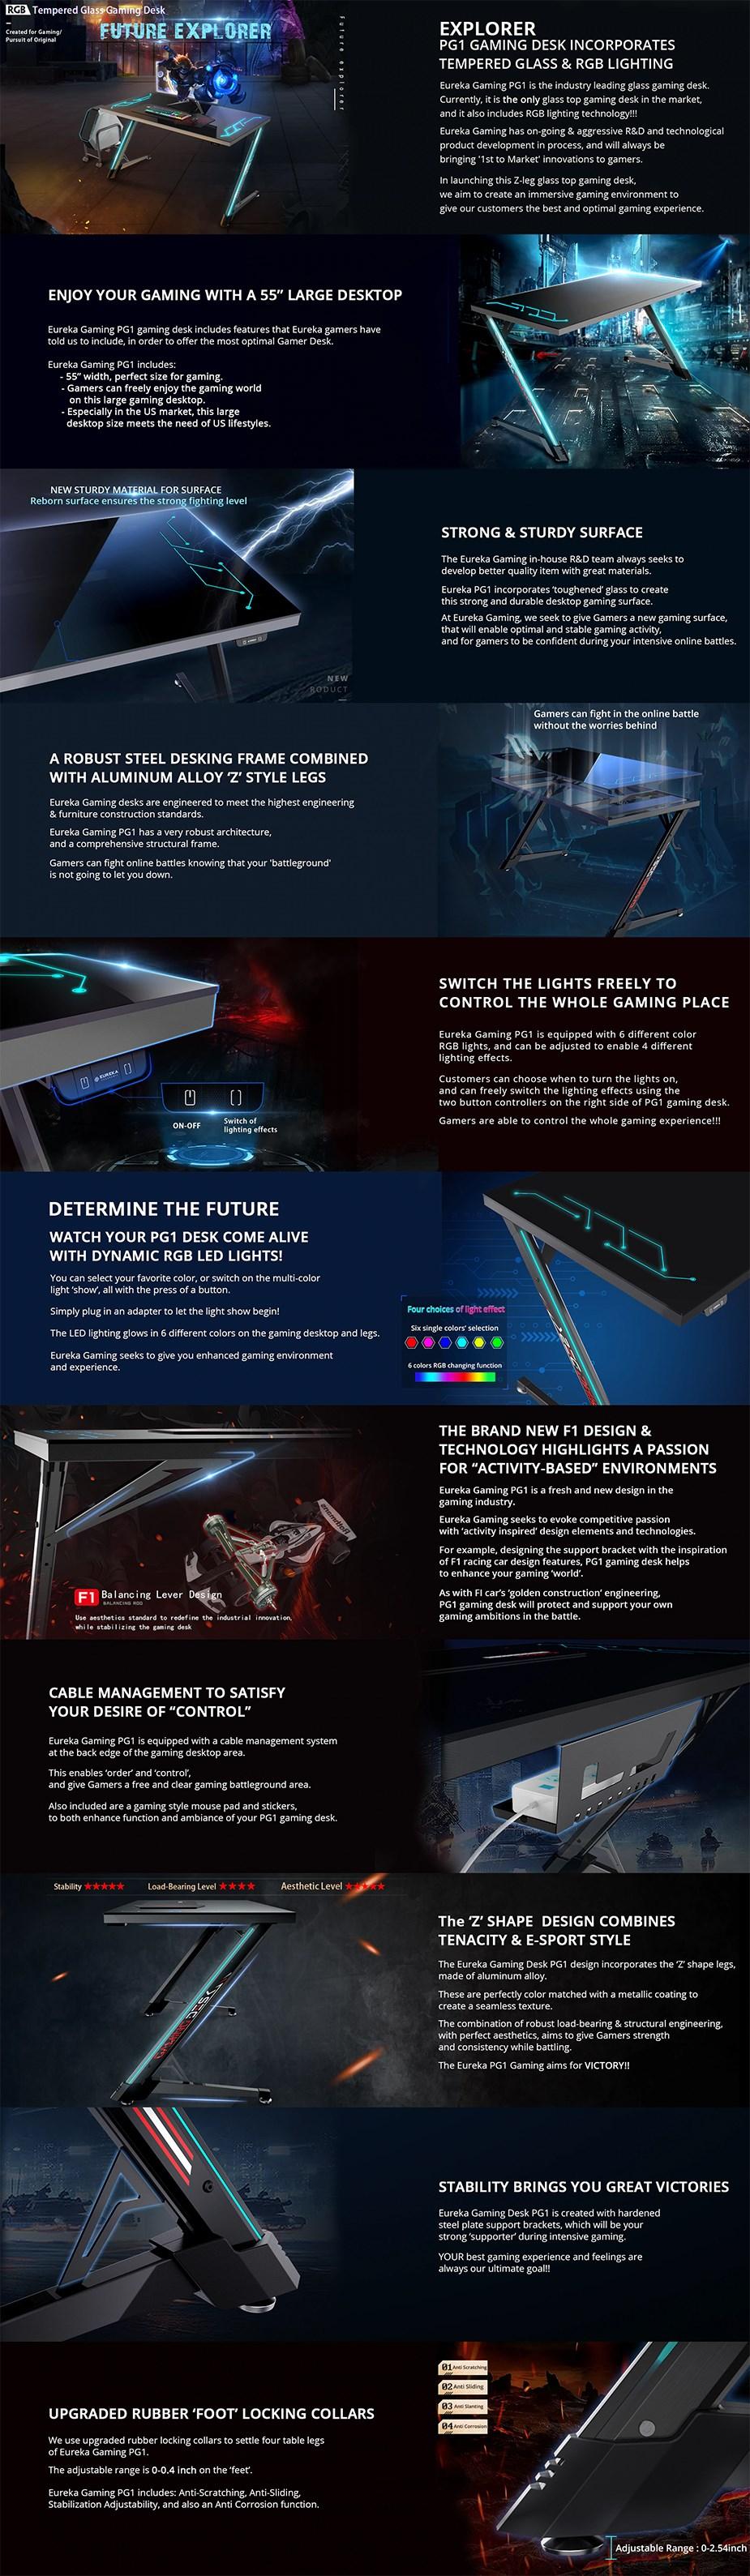 "Eureka Ergonomic PG1 55"" RGB Tempered Glass Gaming Desk - Overview 1"